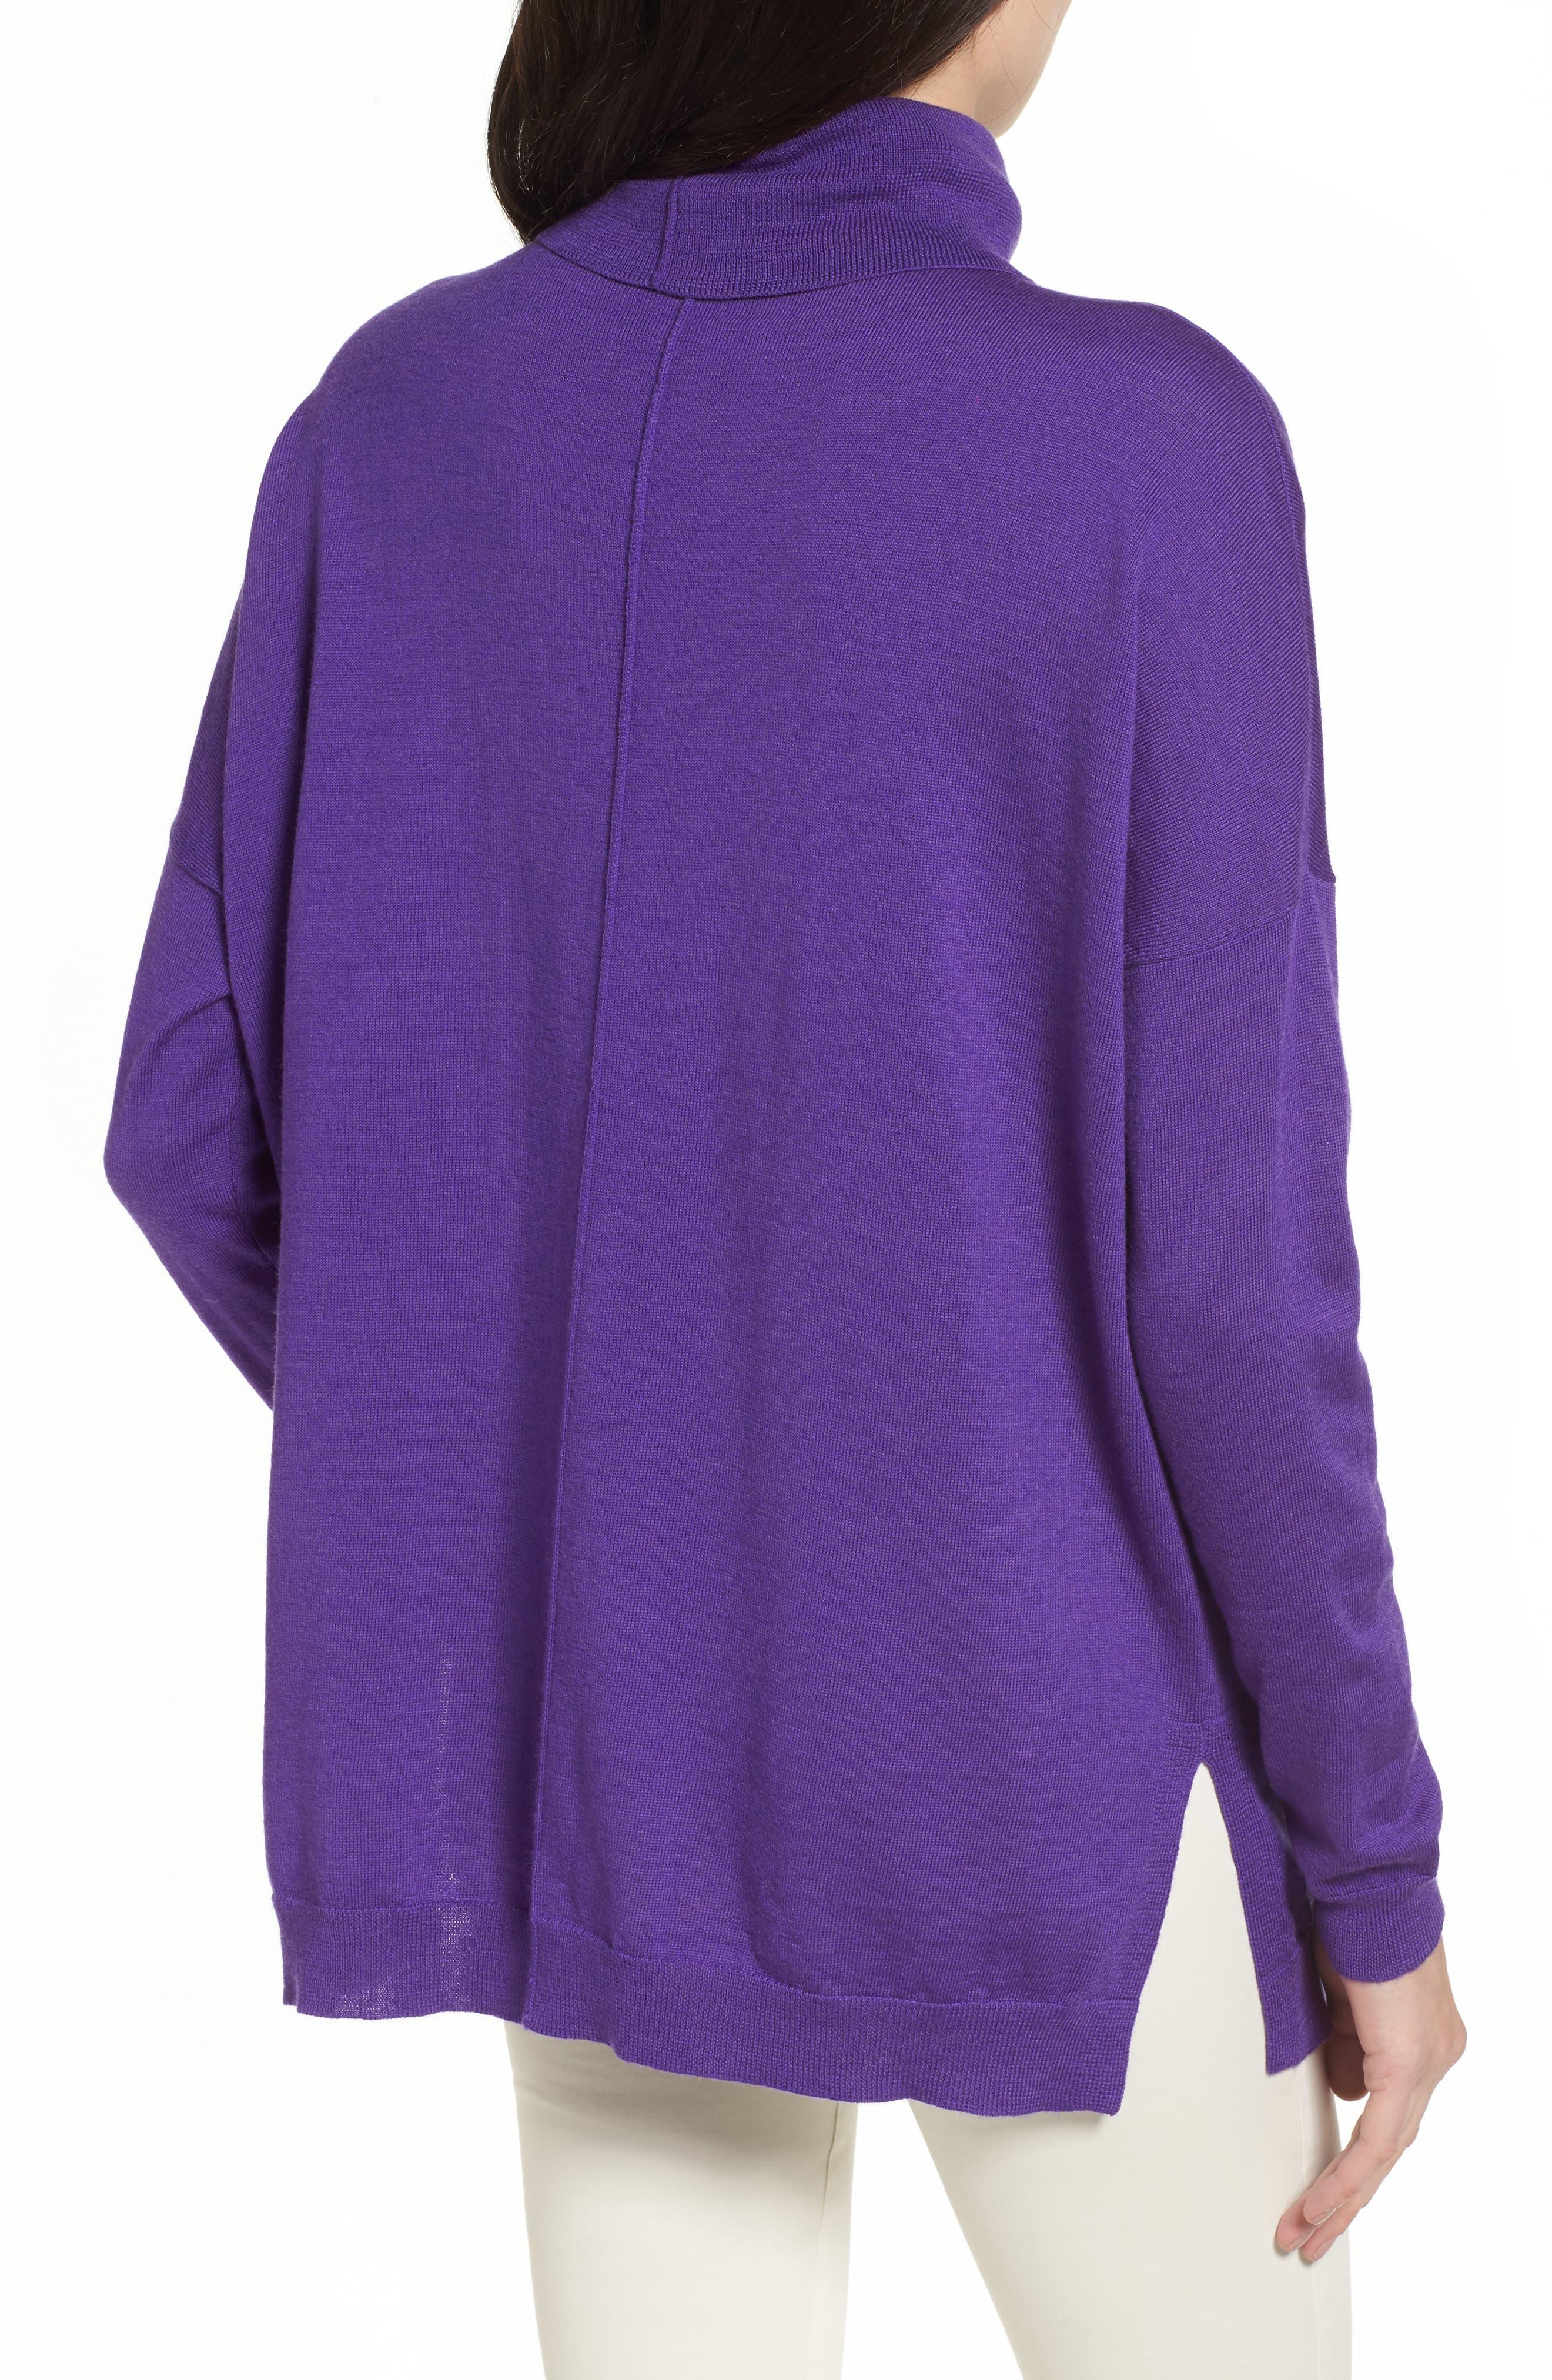 Merino Wool Boxy Turtleneck Sweater,                             Alternate thumbnail 11, color,